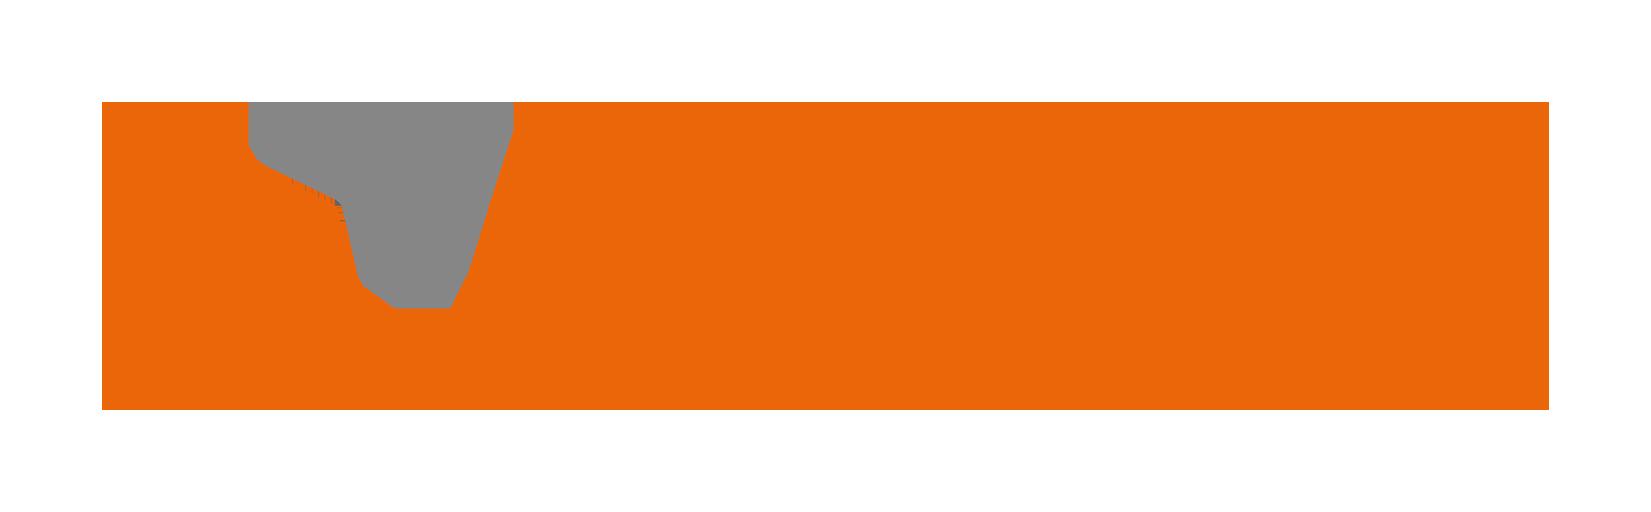 Leitwert